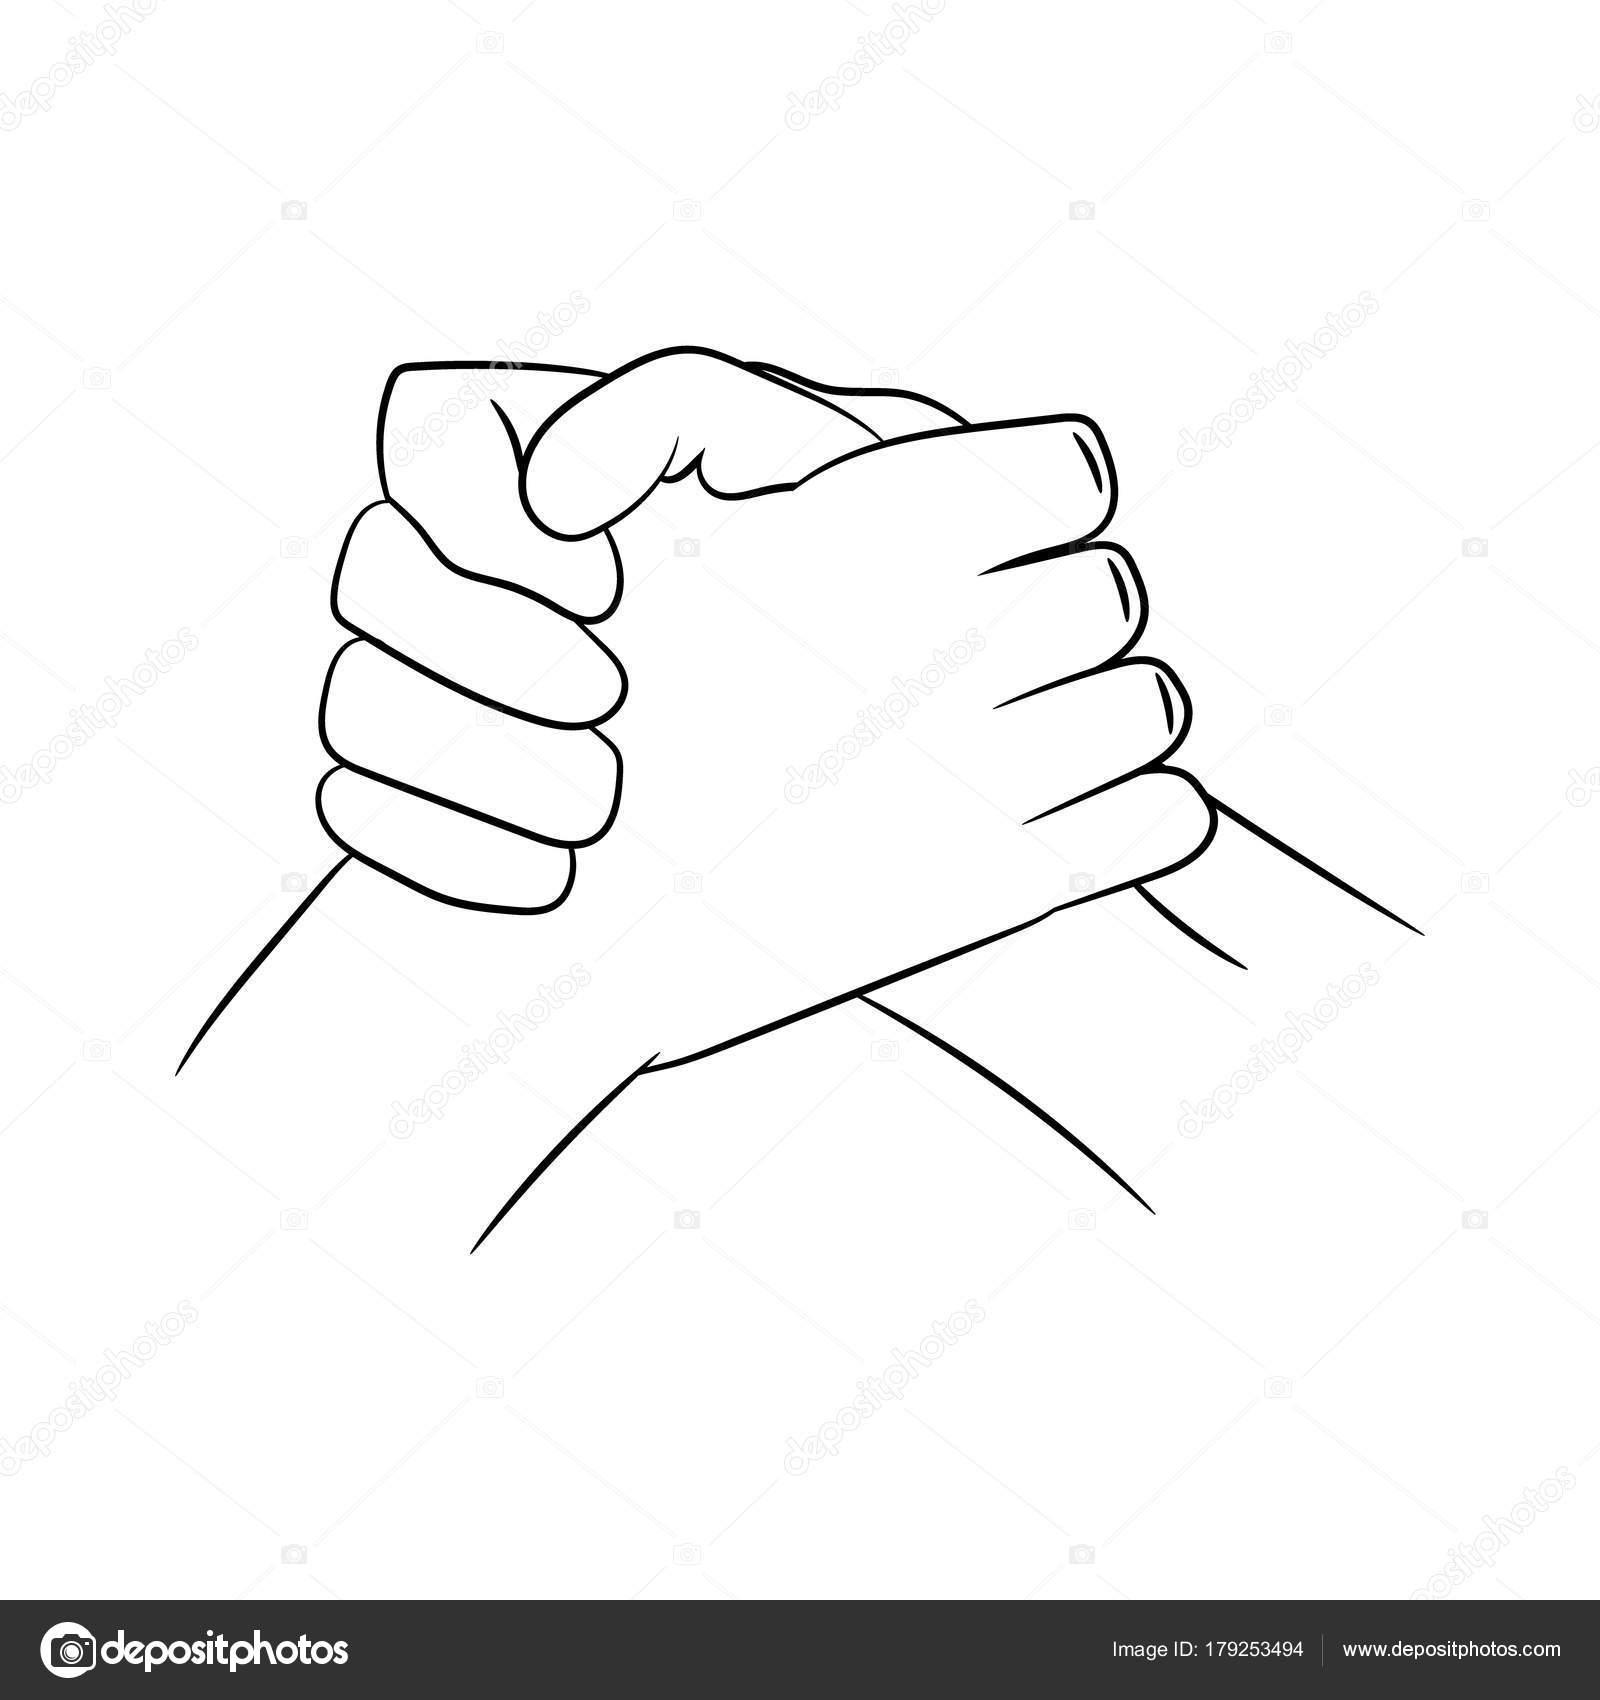 Poign e de main traditionnelle biker illustration - Main en dessin ...